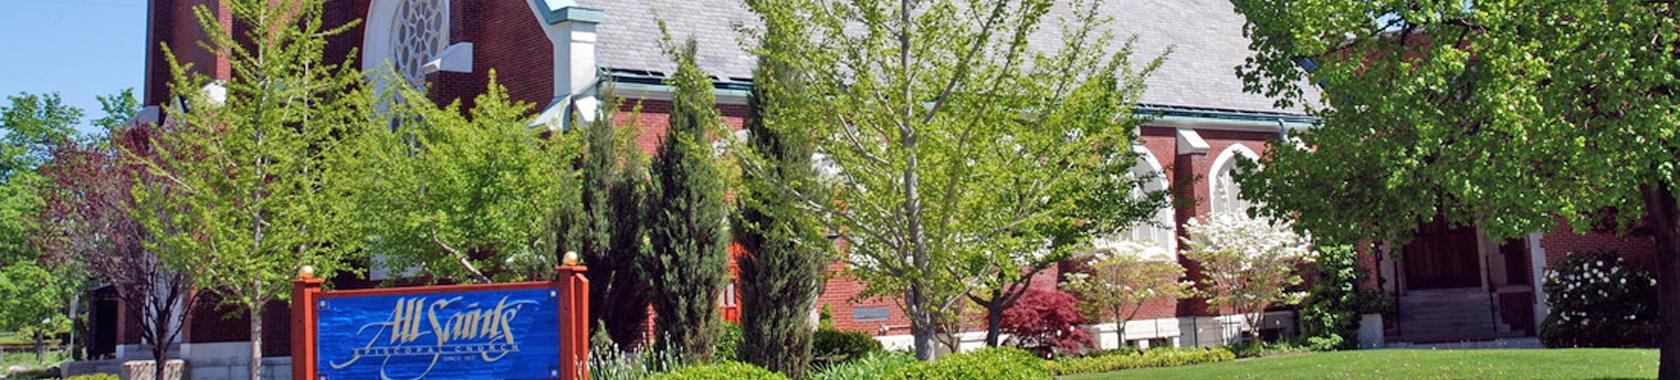 Place of Worship Tours – All Saints' Episcopal Church